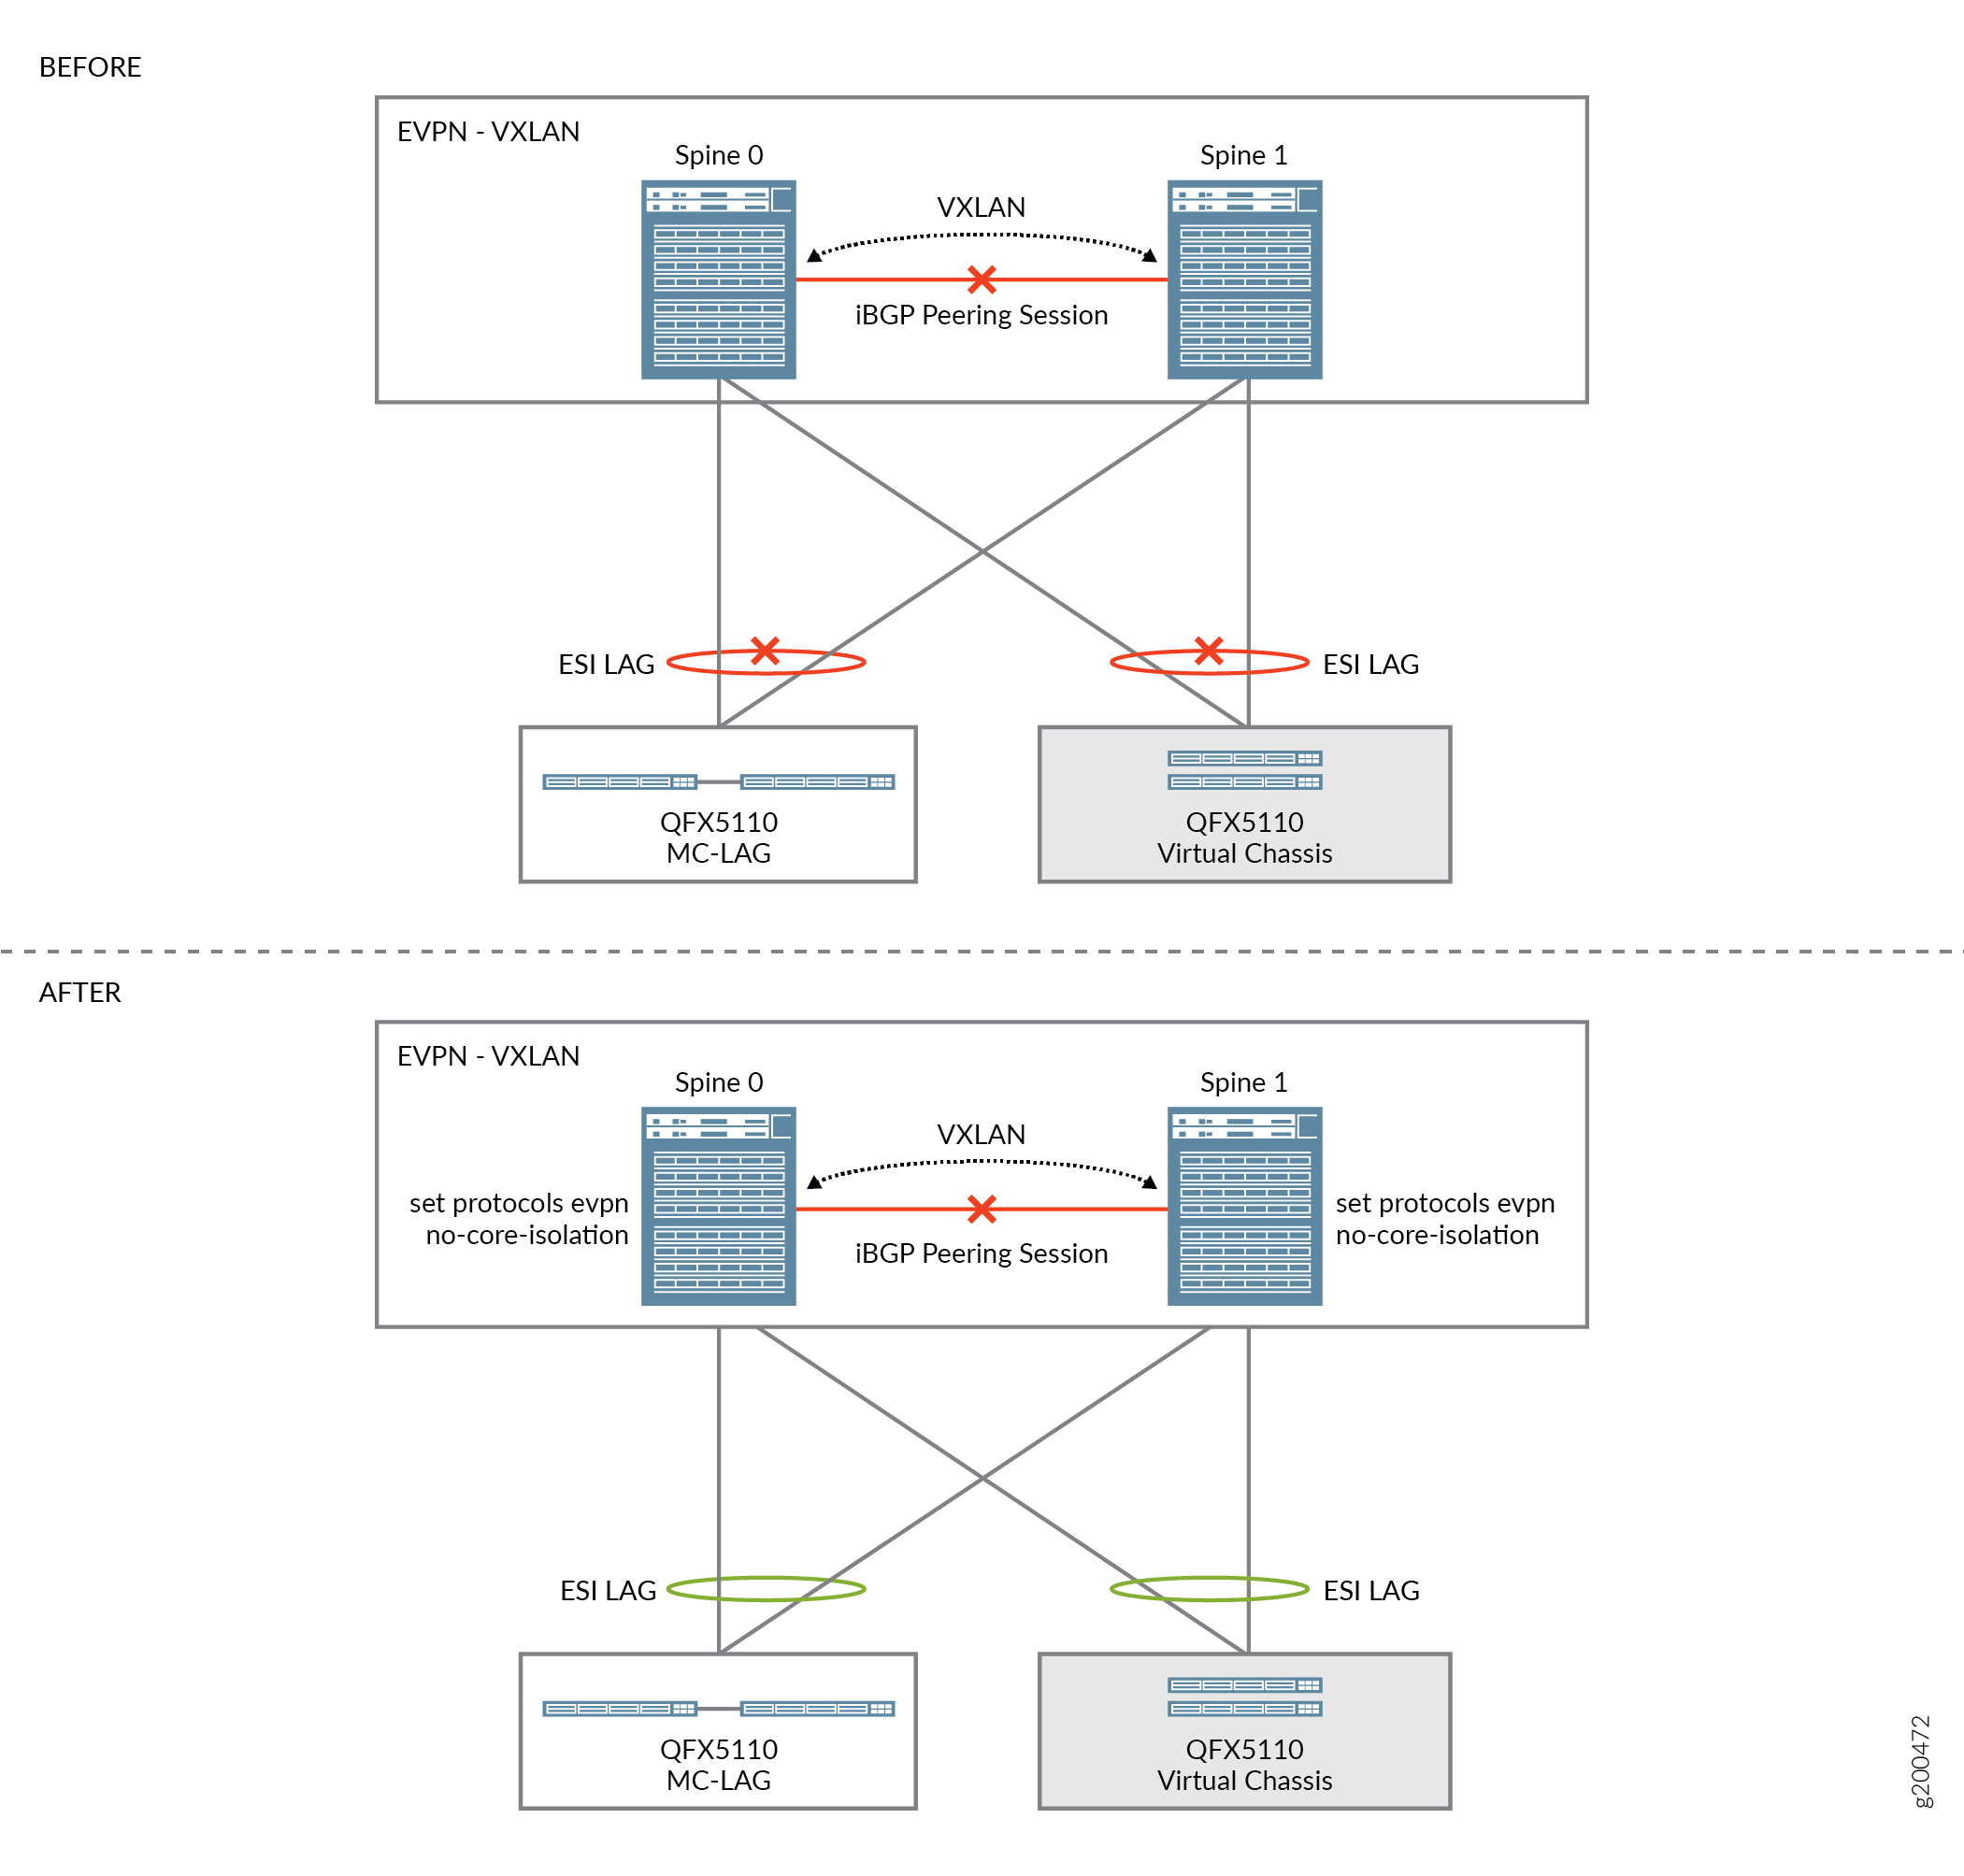 Understanding When to Disable EVPN-VXLAN Core Isolation